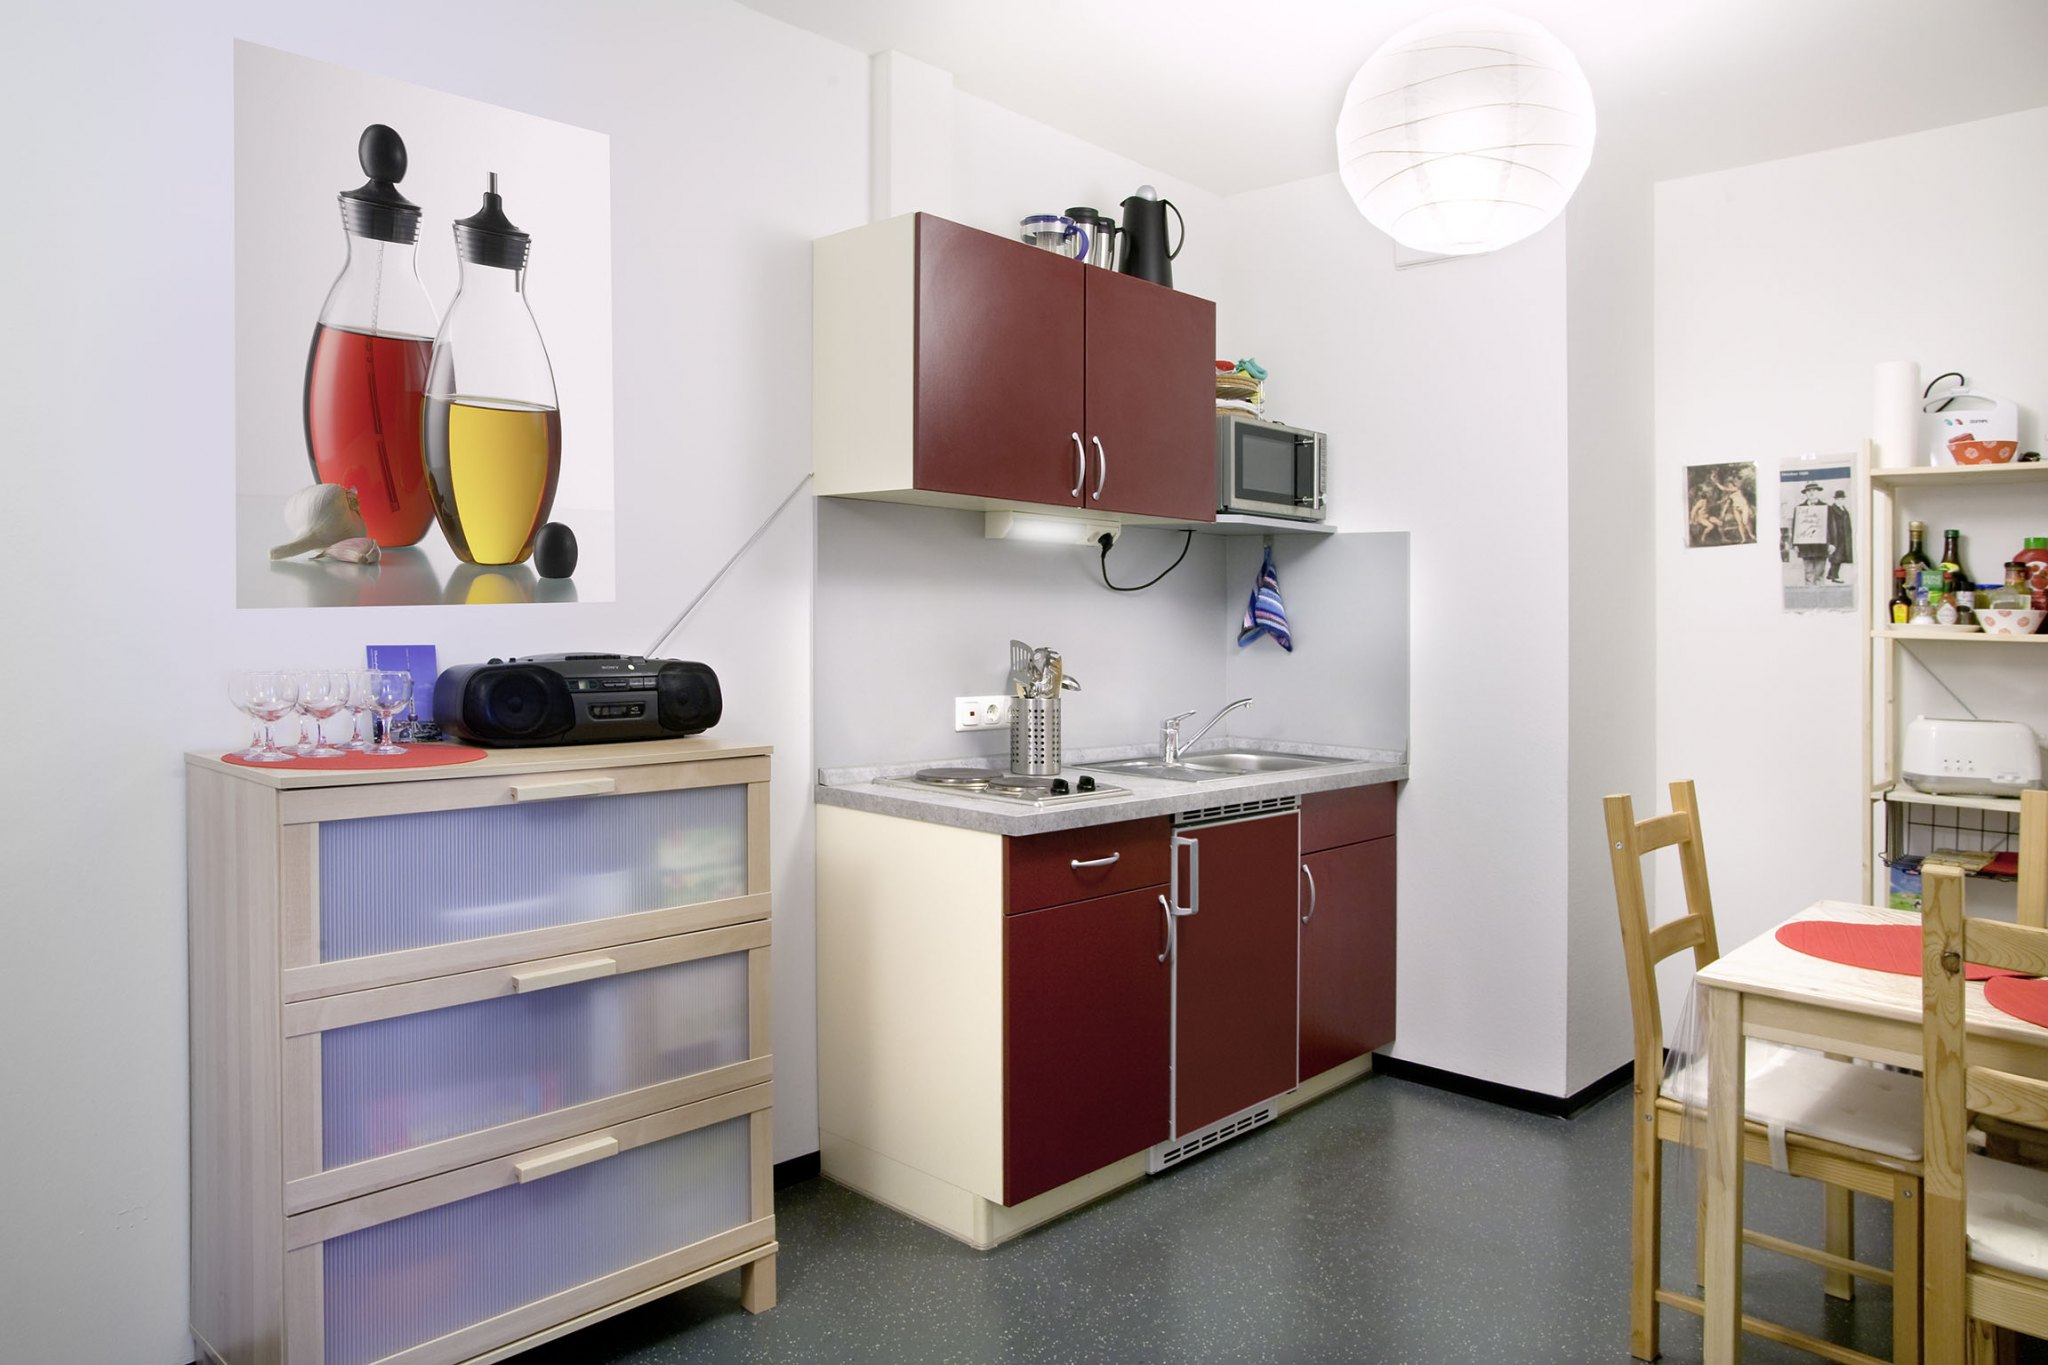 doppelappartement typ c dobak immopartner. Black Bedroom Furniture Sets. Home Design Ideas